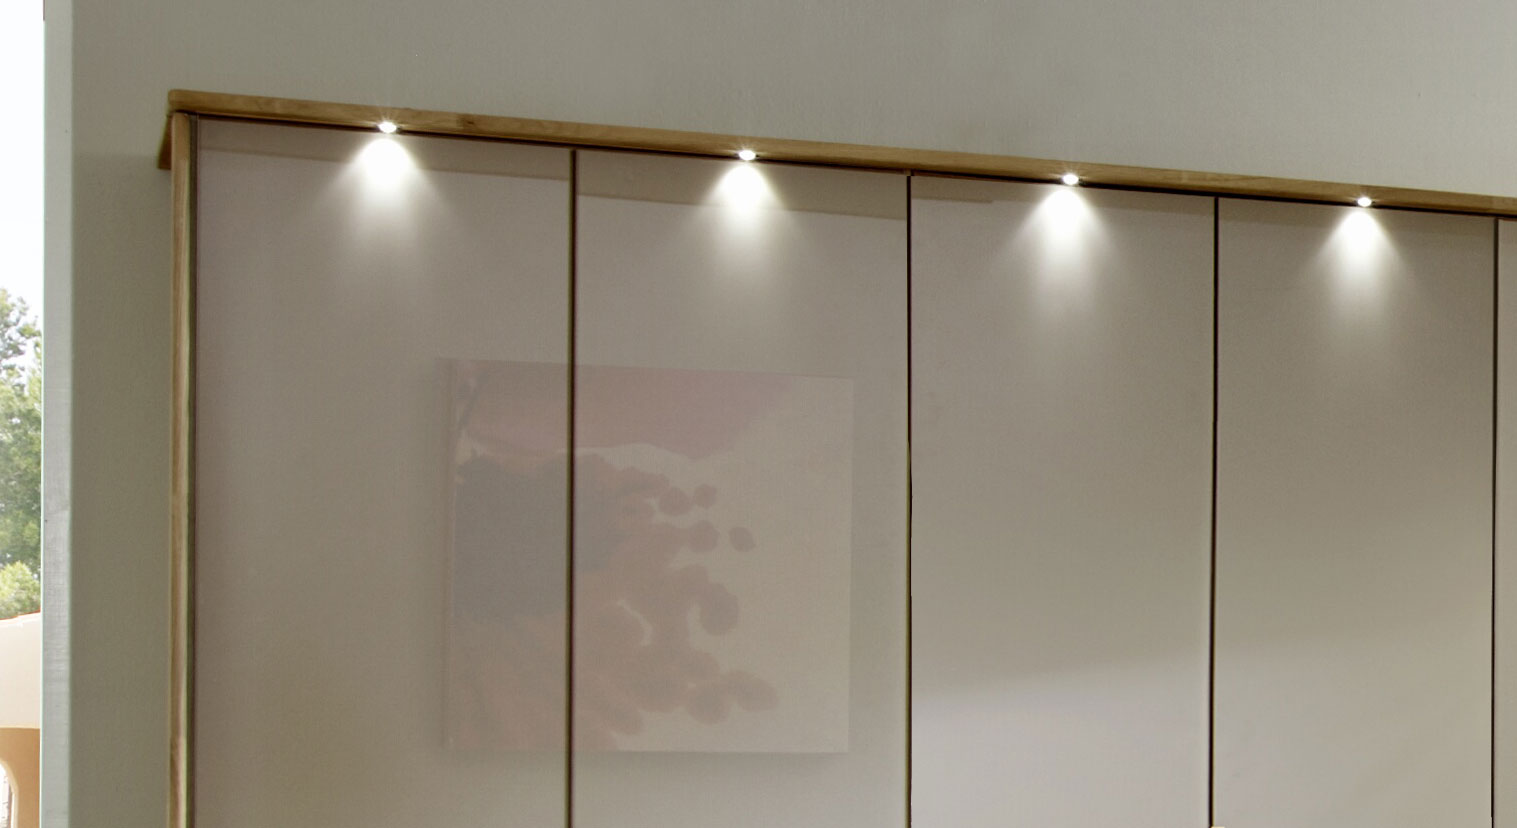 Falttüren-Kleiderschrank Morley in Sahara-Glas mit optionalem Rahmen